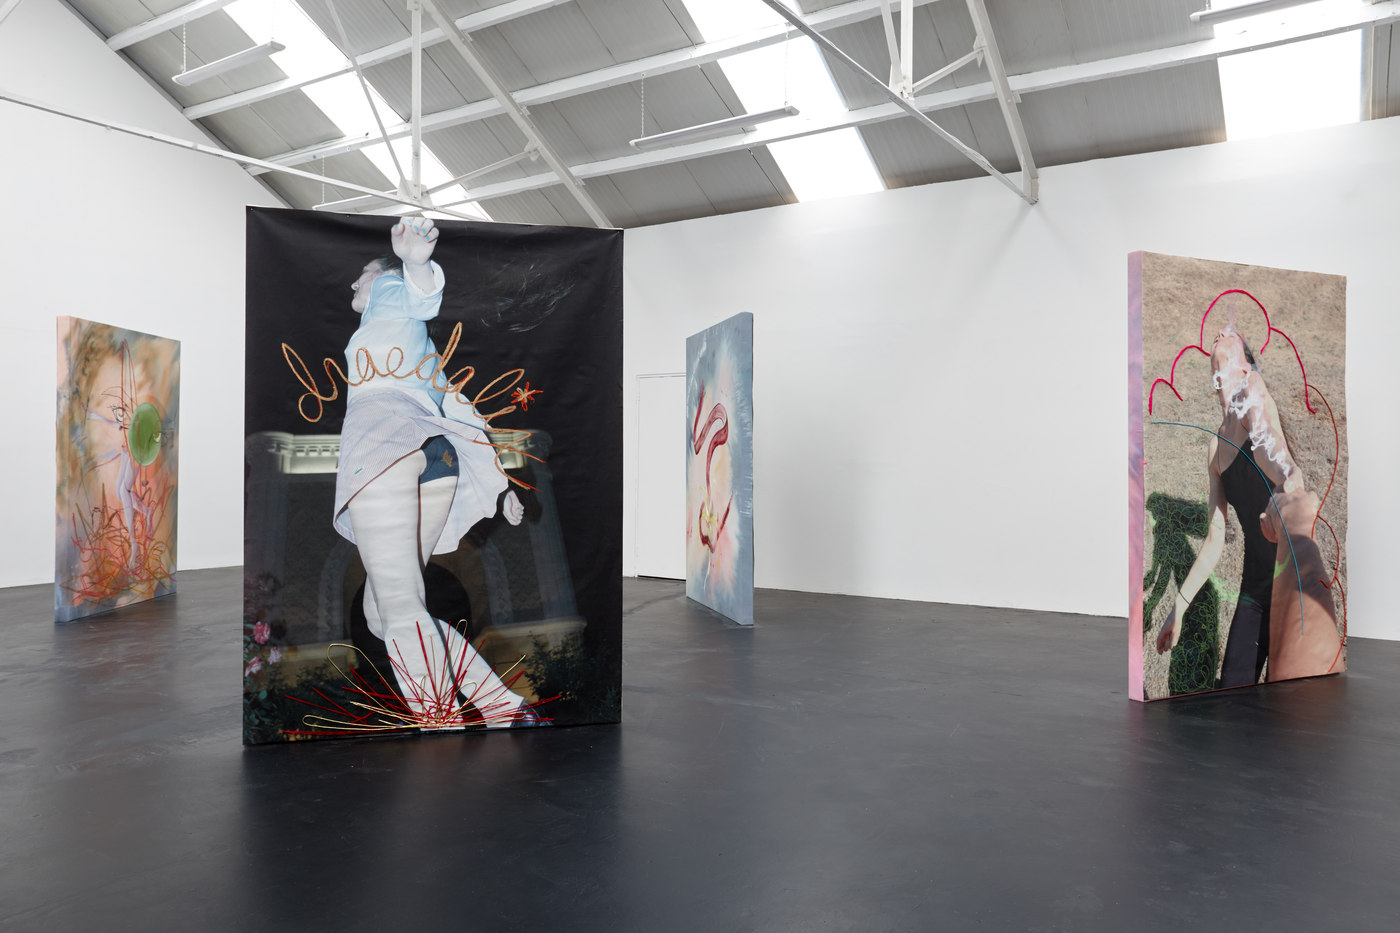 05. Nora Berman - Charm - Installation View V